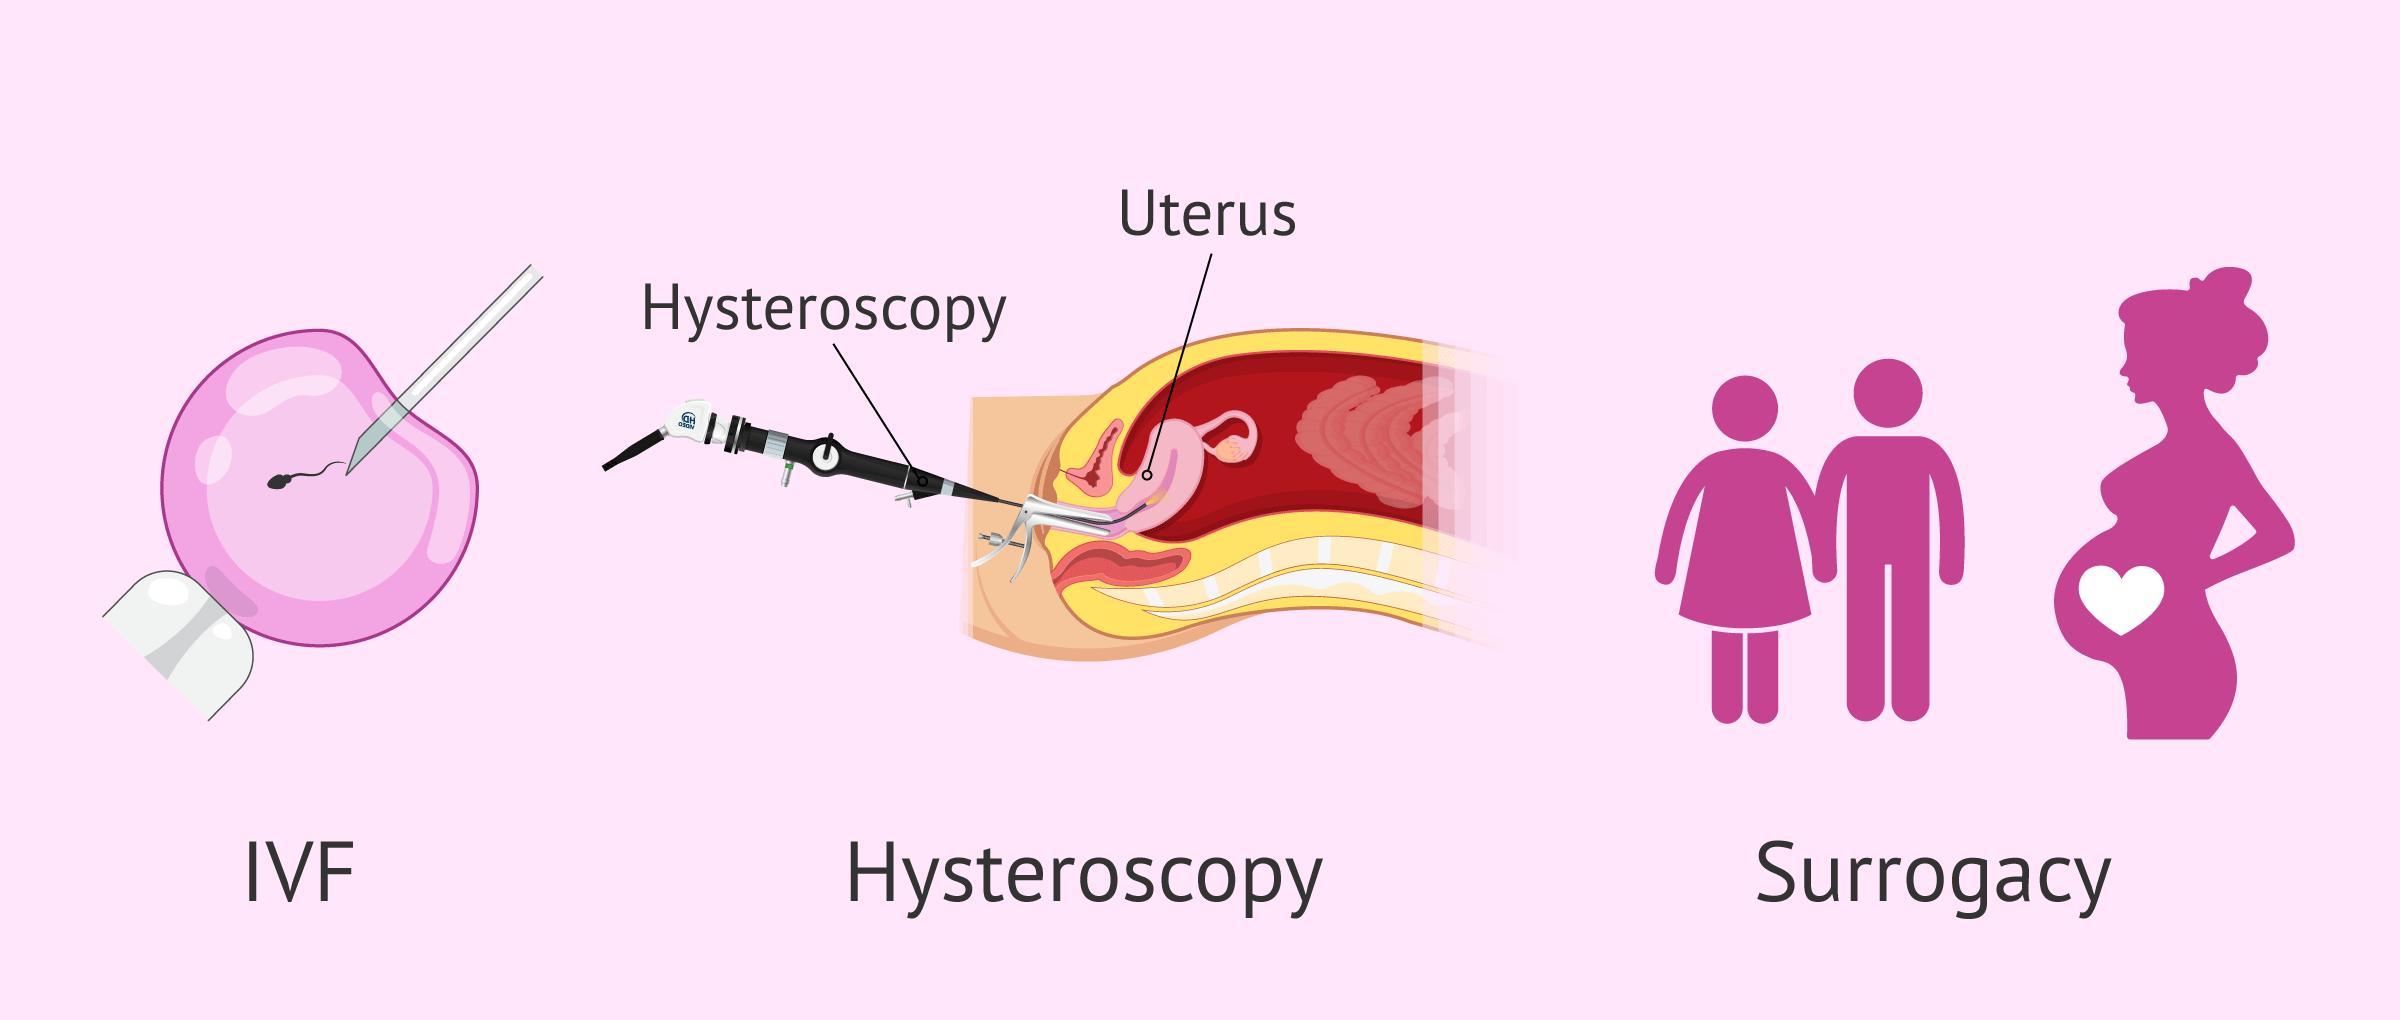 Uterine Anomalies - Types, Impact on Fertility & Treatment